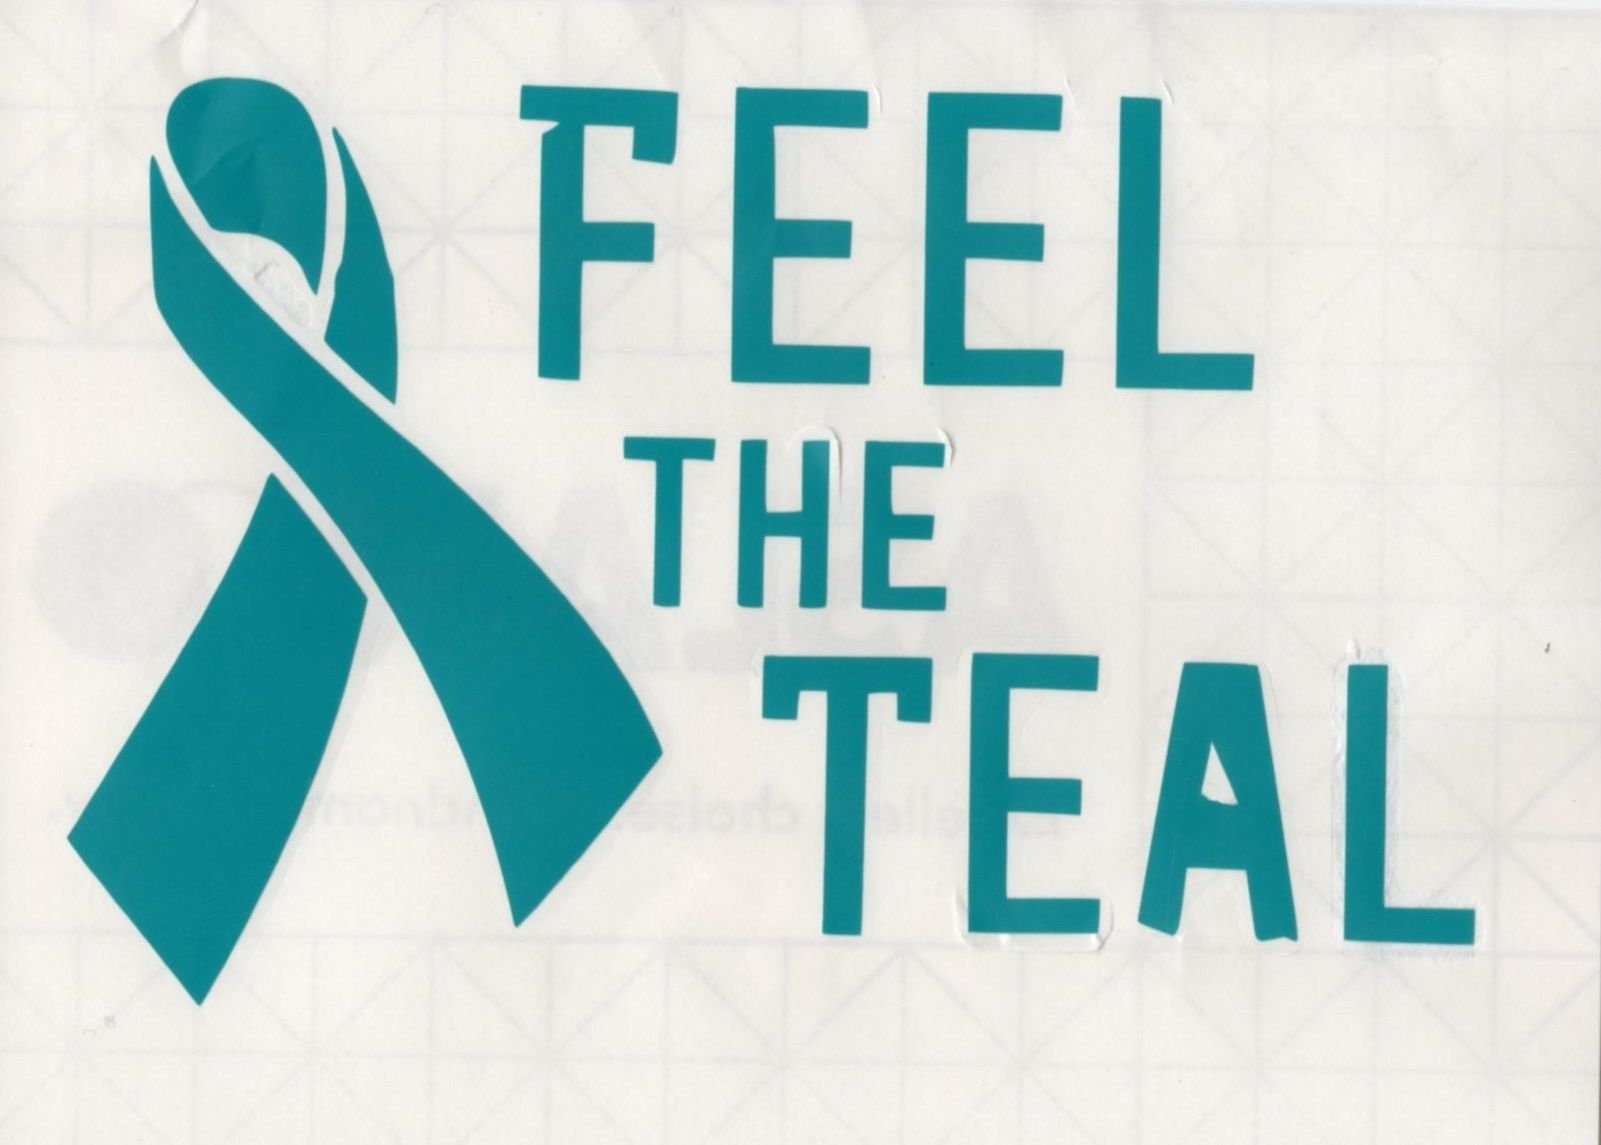 Feel the teal ovarian cancer awareness decal www feel the teal ovarian cancer awareness decal teambethcancerawareness biocorpaavc